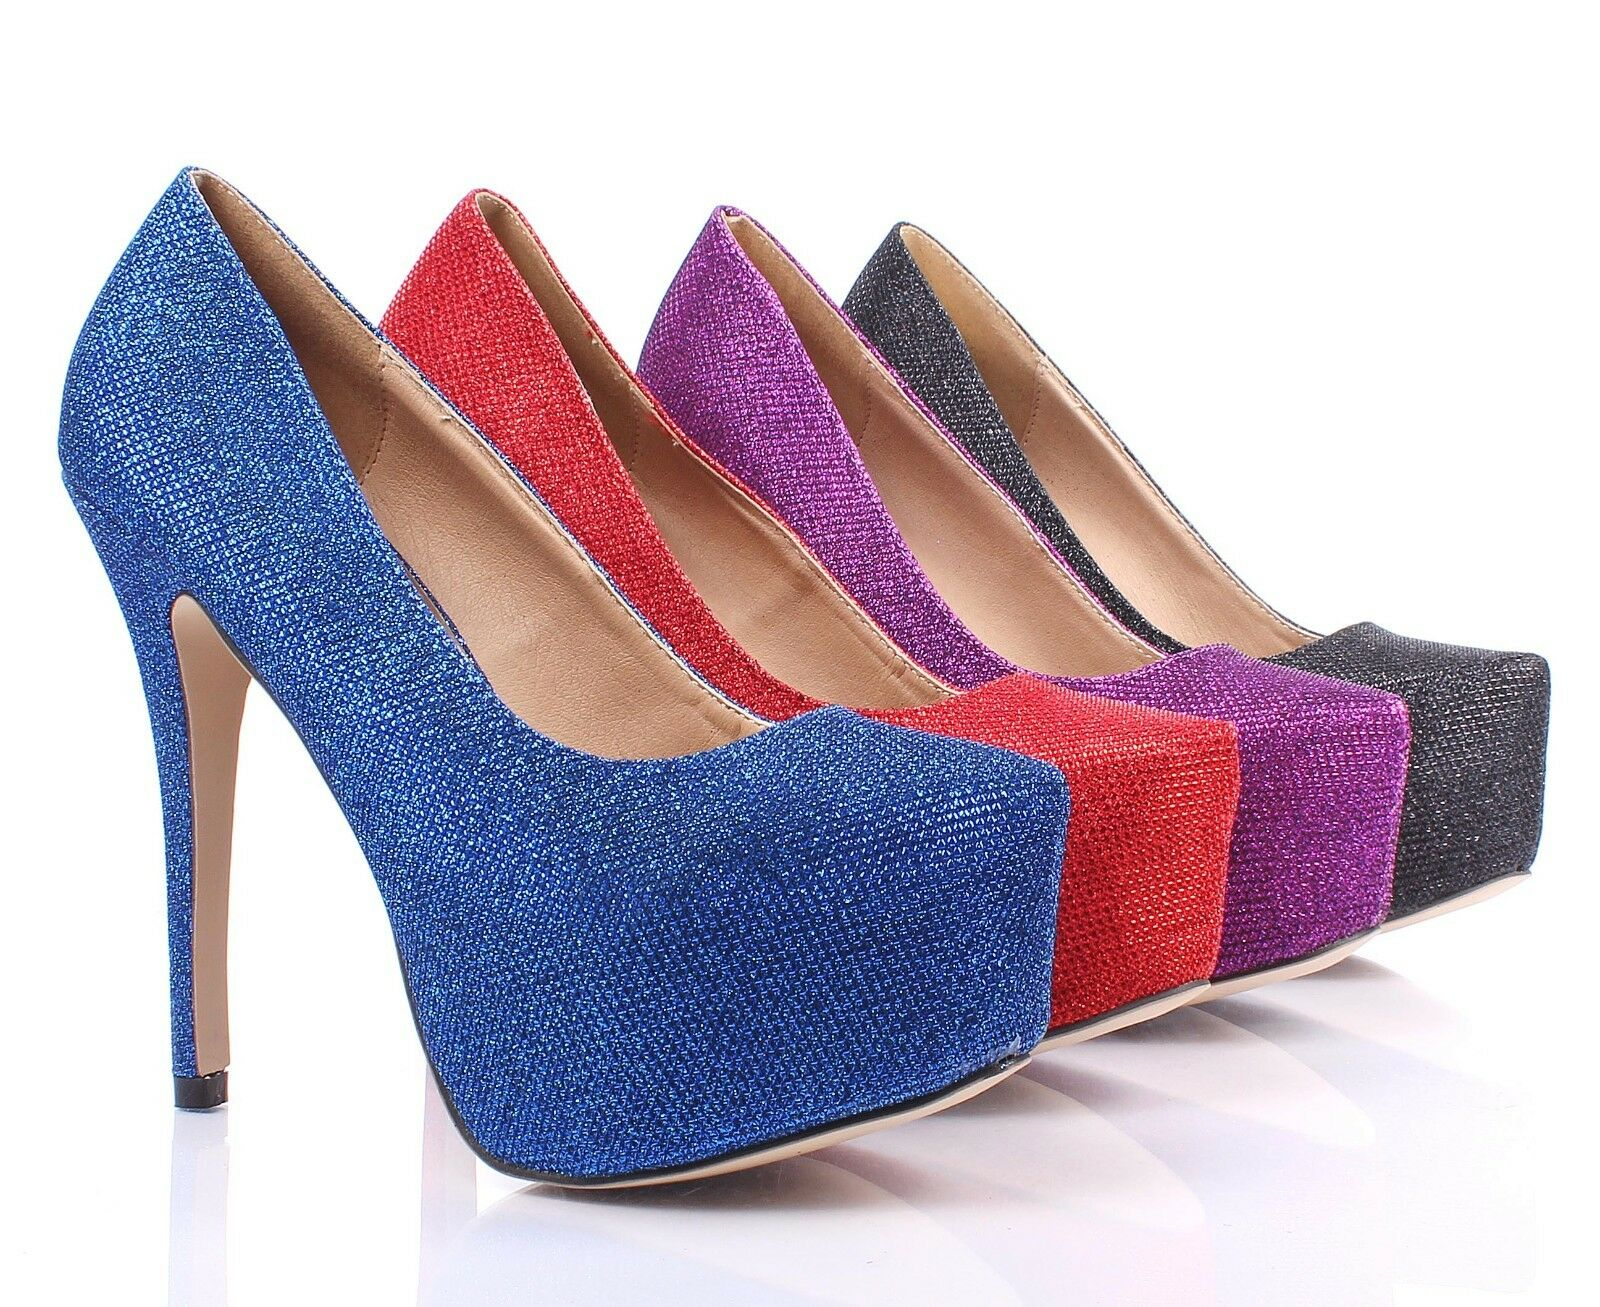 46e2cb0b550 Details about 4 Color Glitter Stilettos Slip On Fashion Pumps Platform Womens  High Heels Size